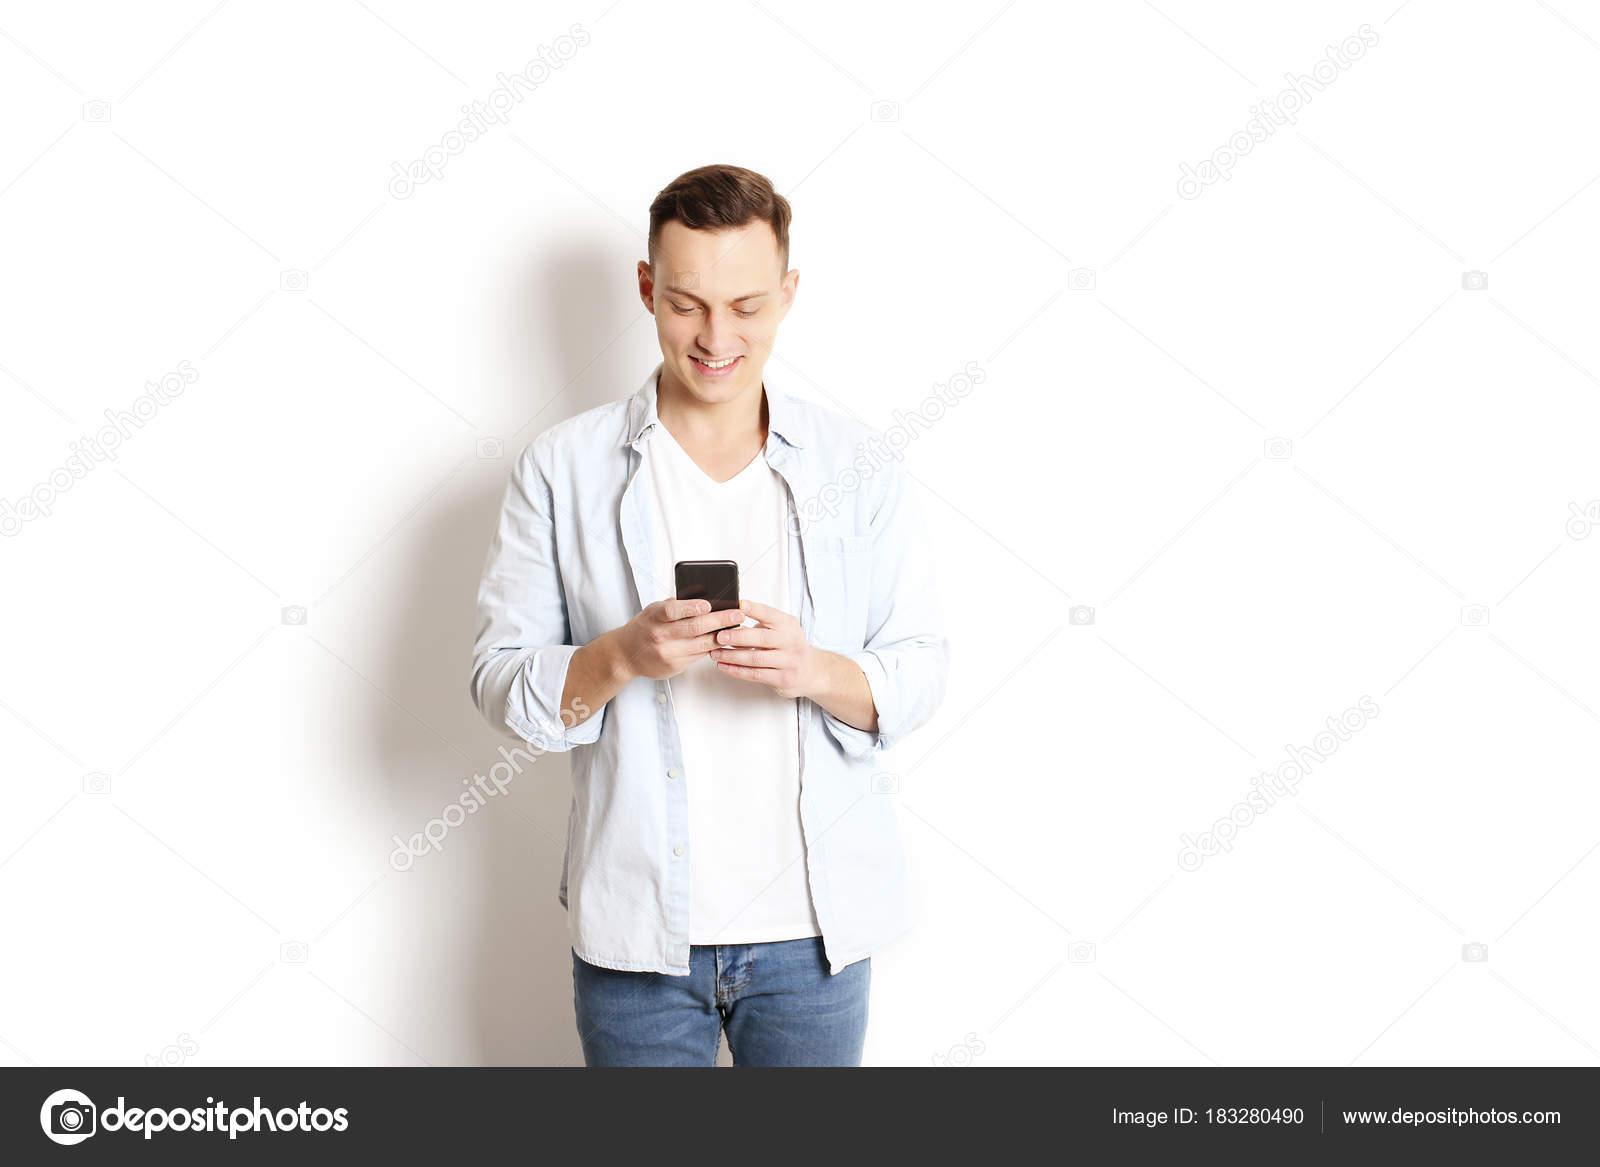 randki tekstowe 100 za darmo